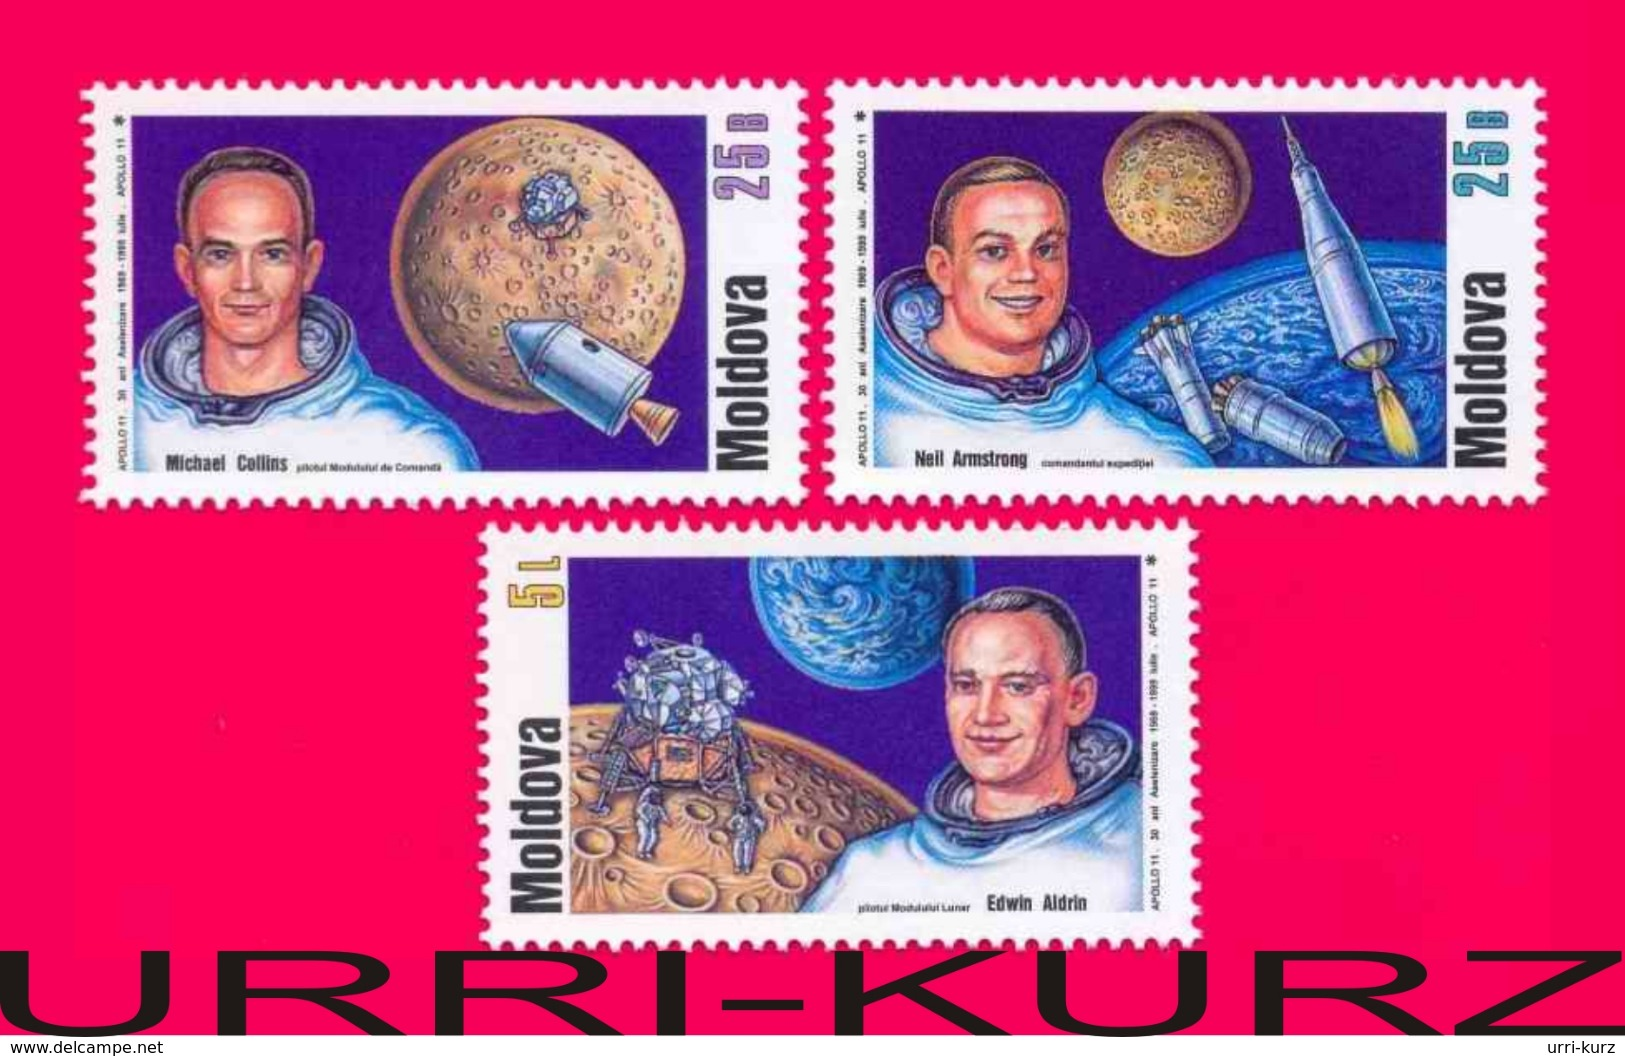 MOLDOVA 1999 Space USA Astronauts Apollo-11 First Moon Landing 30th Anniversary 3v Sc308-310 Mi312-314 MNH - Space